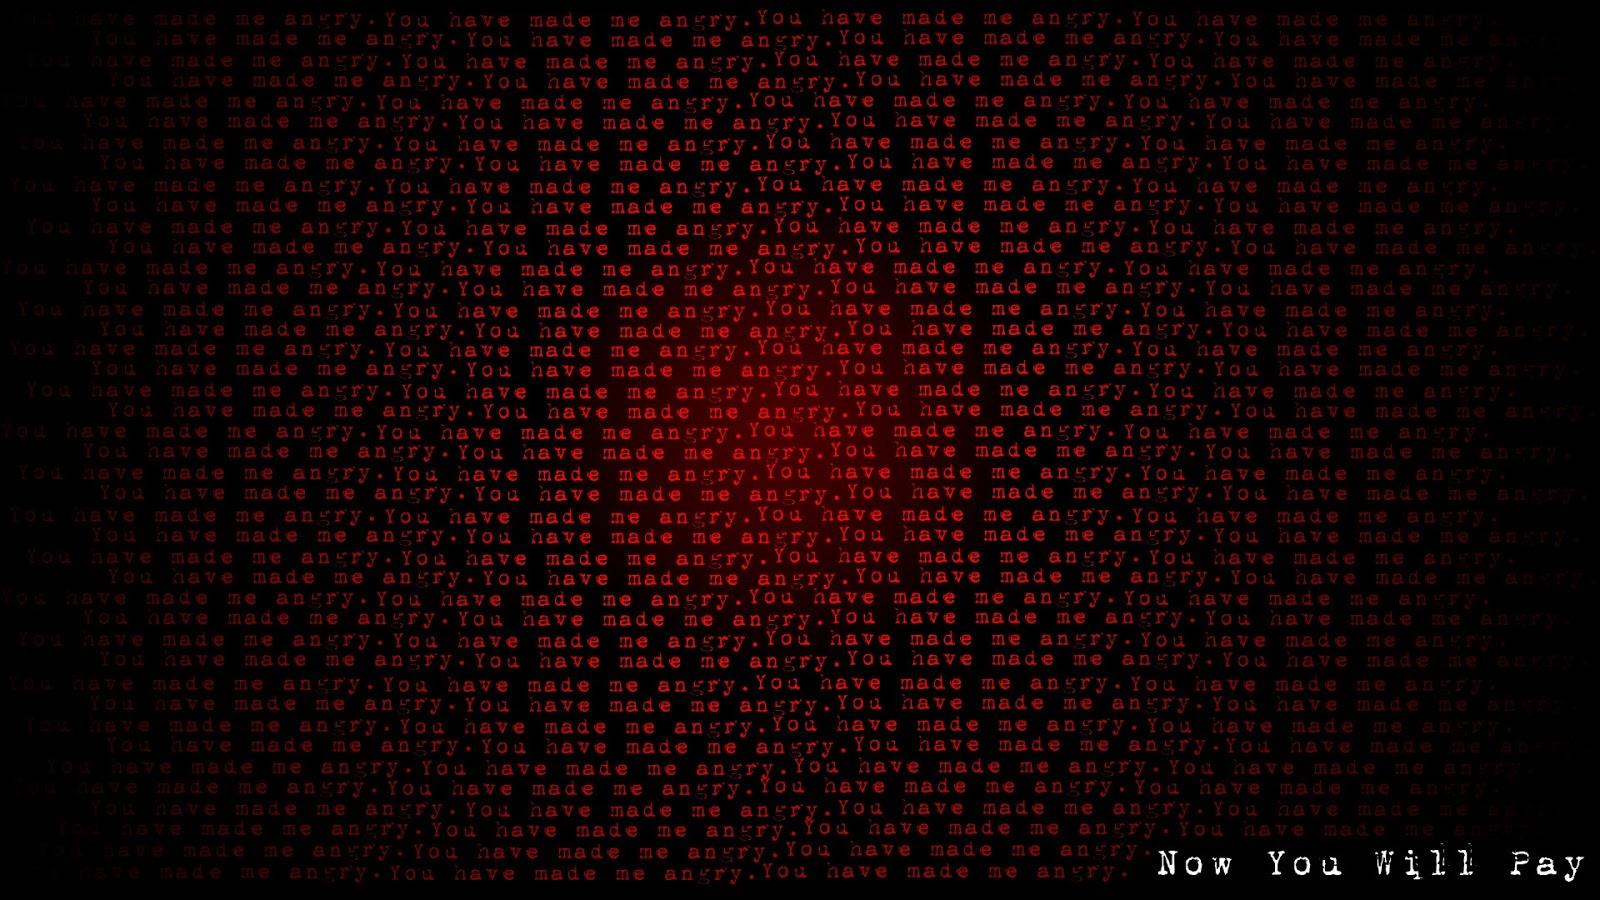 linux hacker background - photo #23